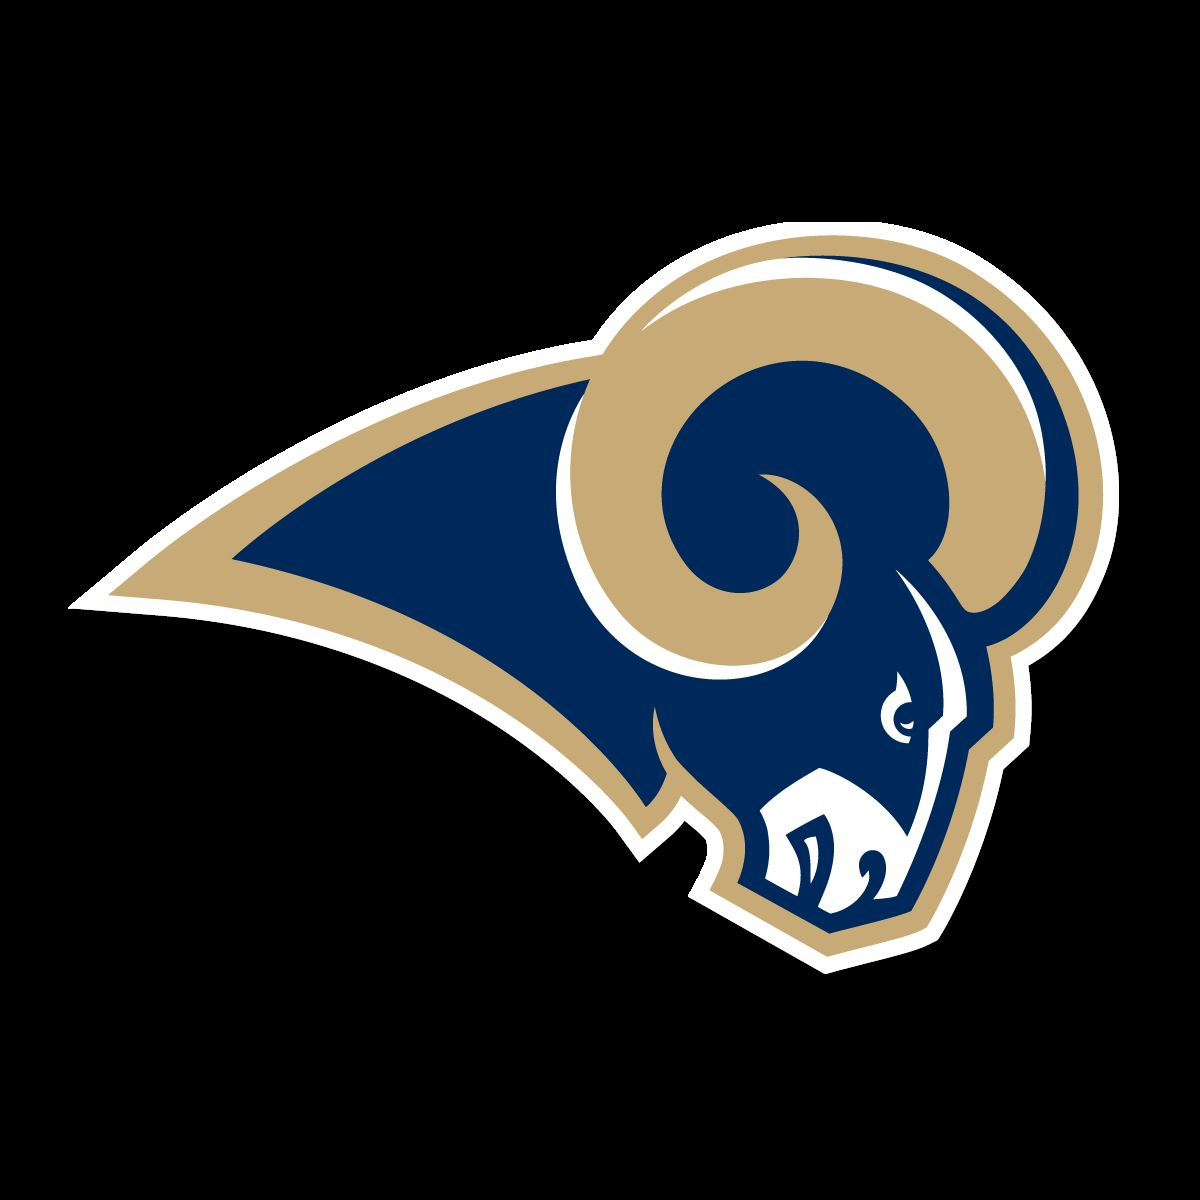 LA Rams Youth Football - Jr. Midget Unlimted